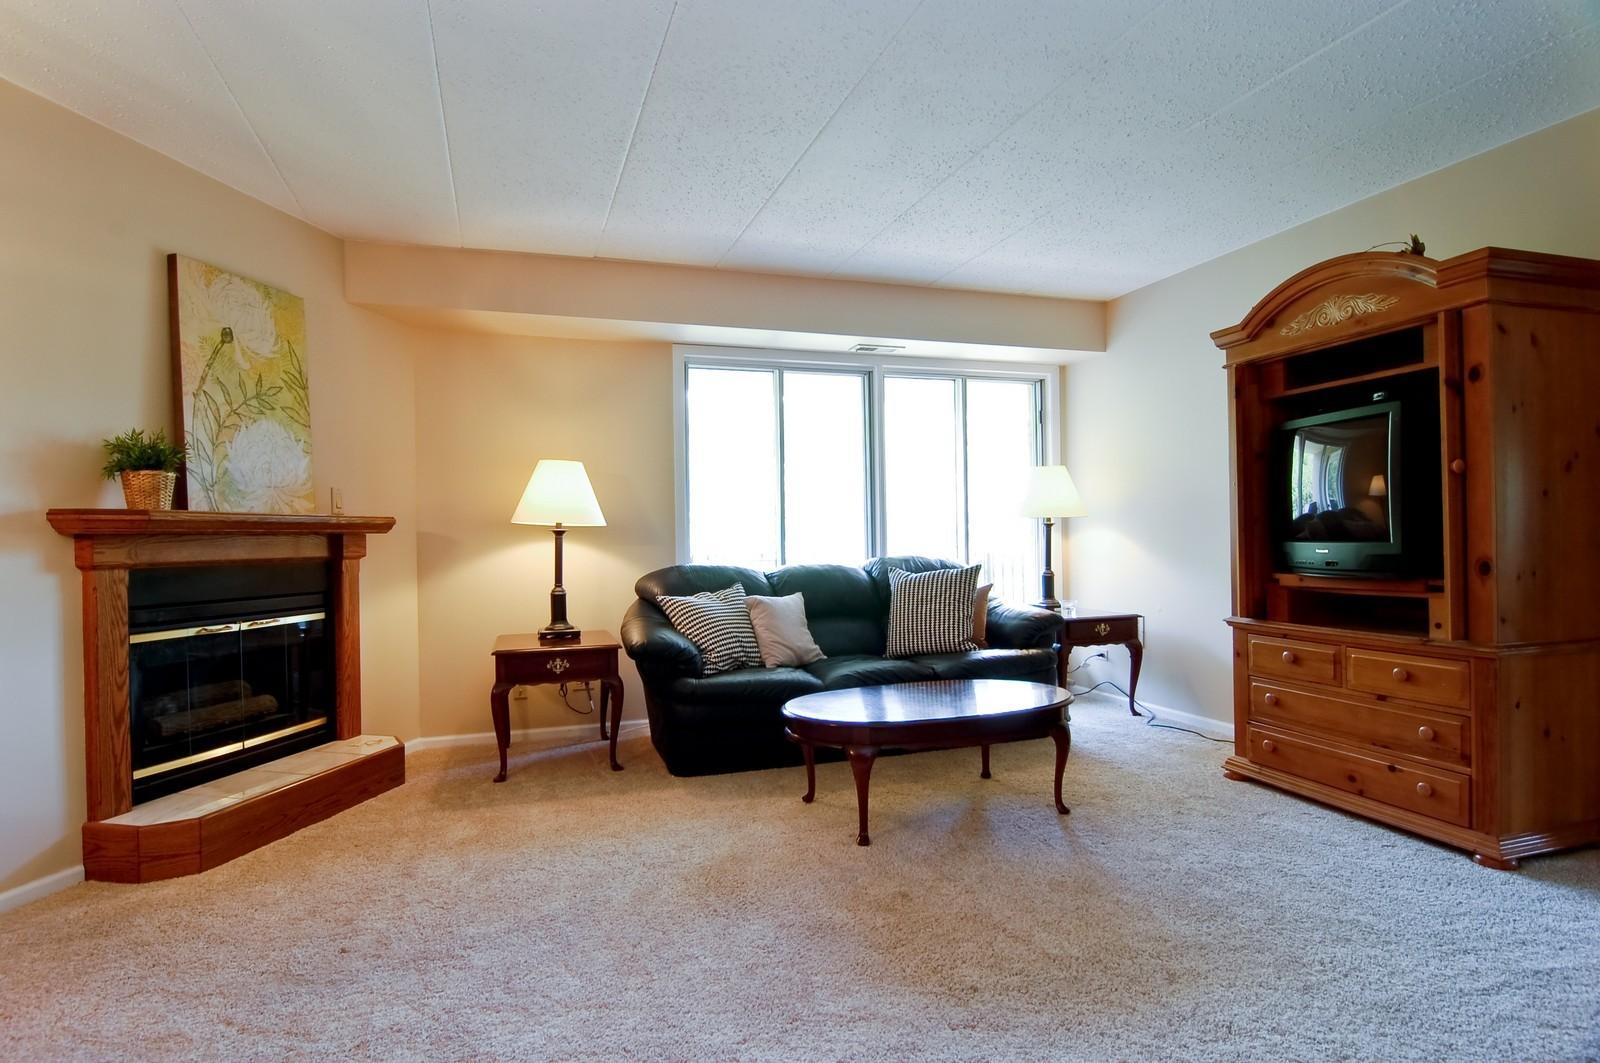 Real Estate Photography - 466 S President, Unit 204, Carol Stream, IL, 60188 - Living Room